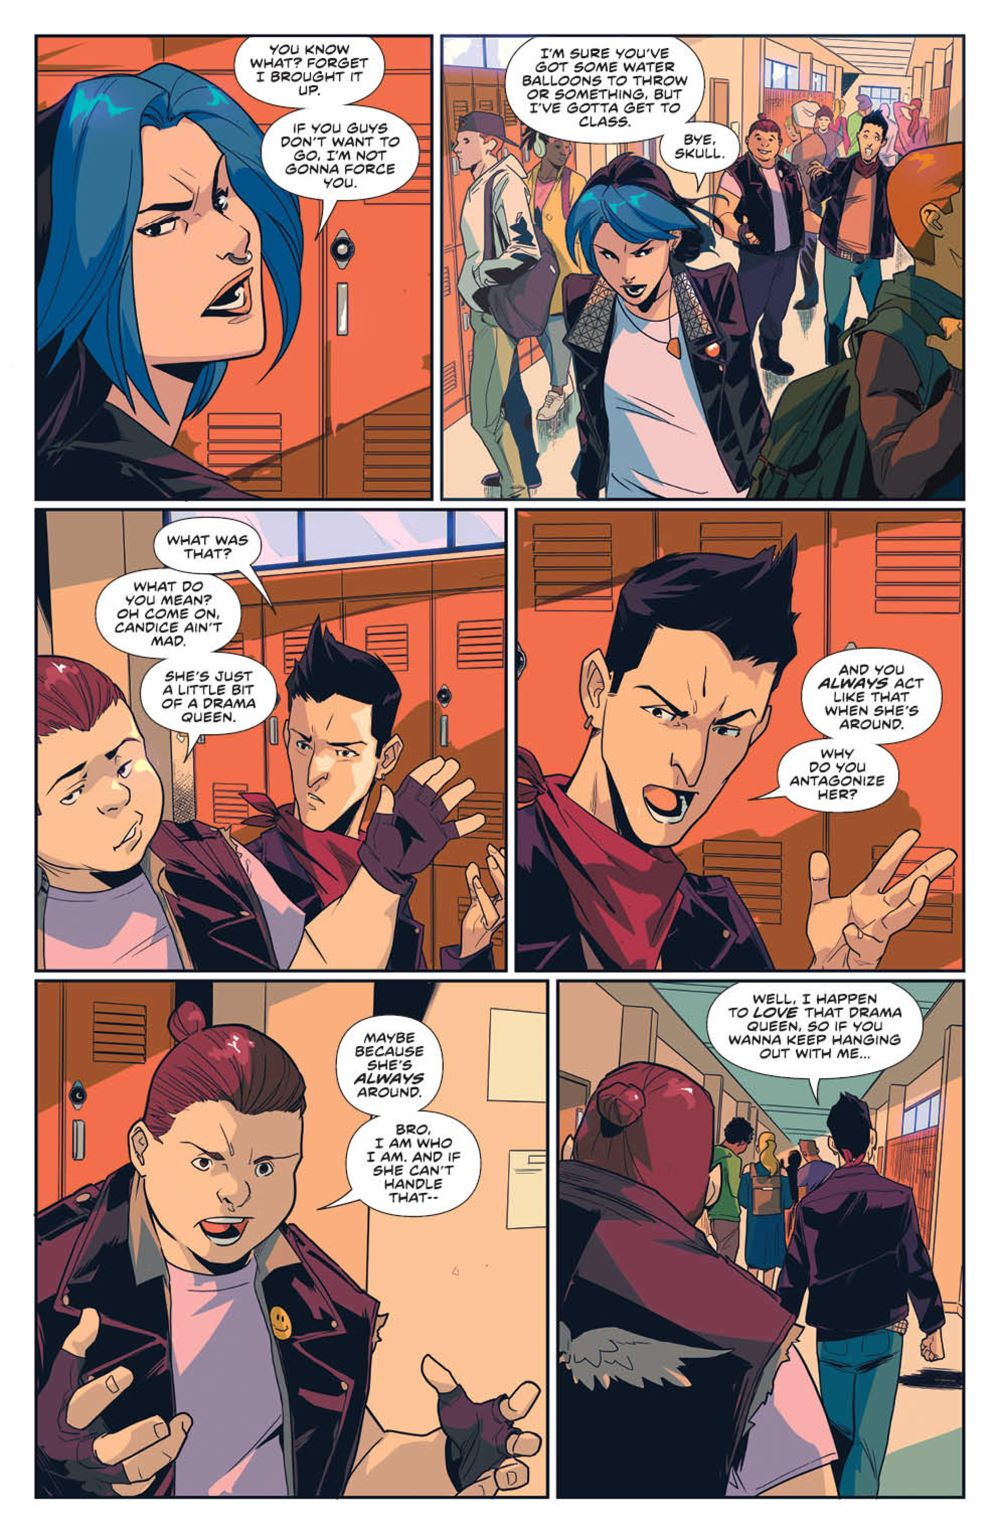 MightyMorphin_v1_SC_PRESS_20 ComicList Previews: MIGHTY MORPHIN VOLUME 1 TP